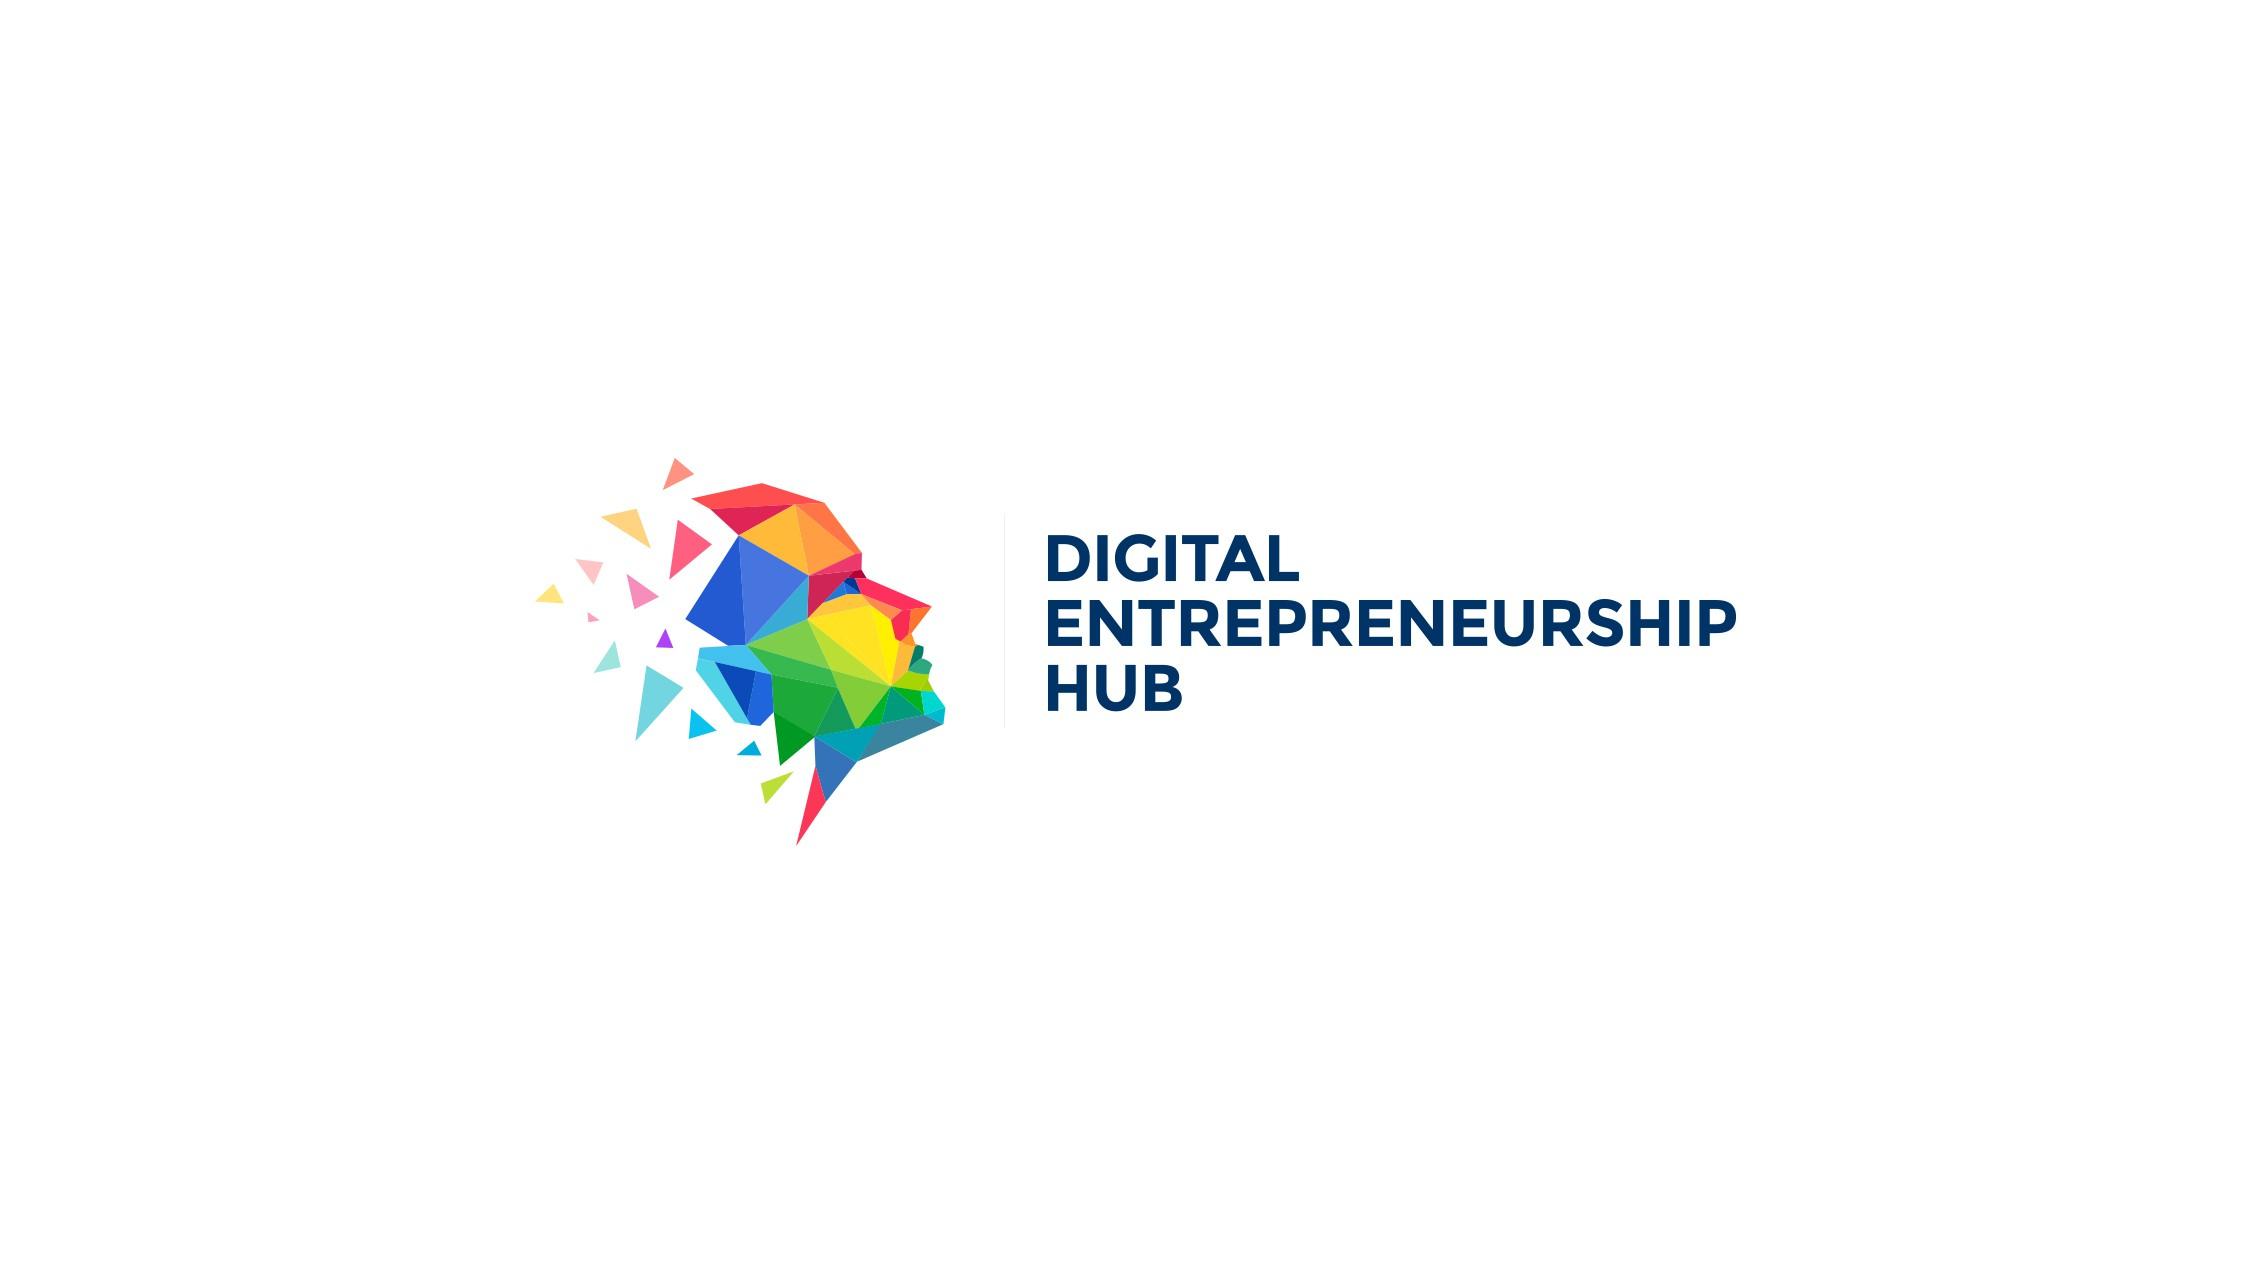 Not only for hipsters in Berlin - a Design for the Digital Entrepreneurship Hub